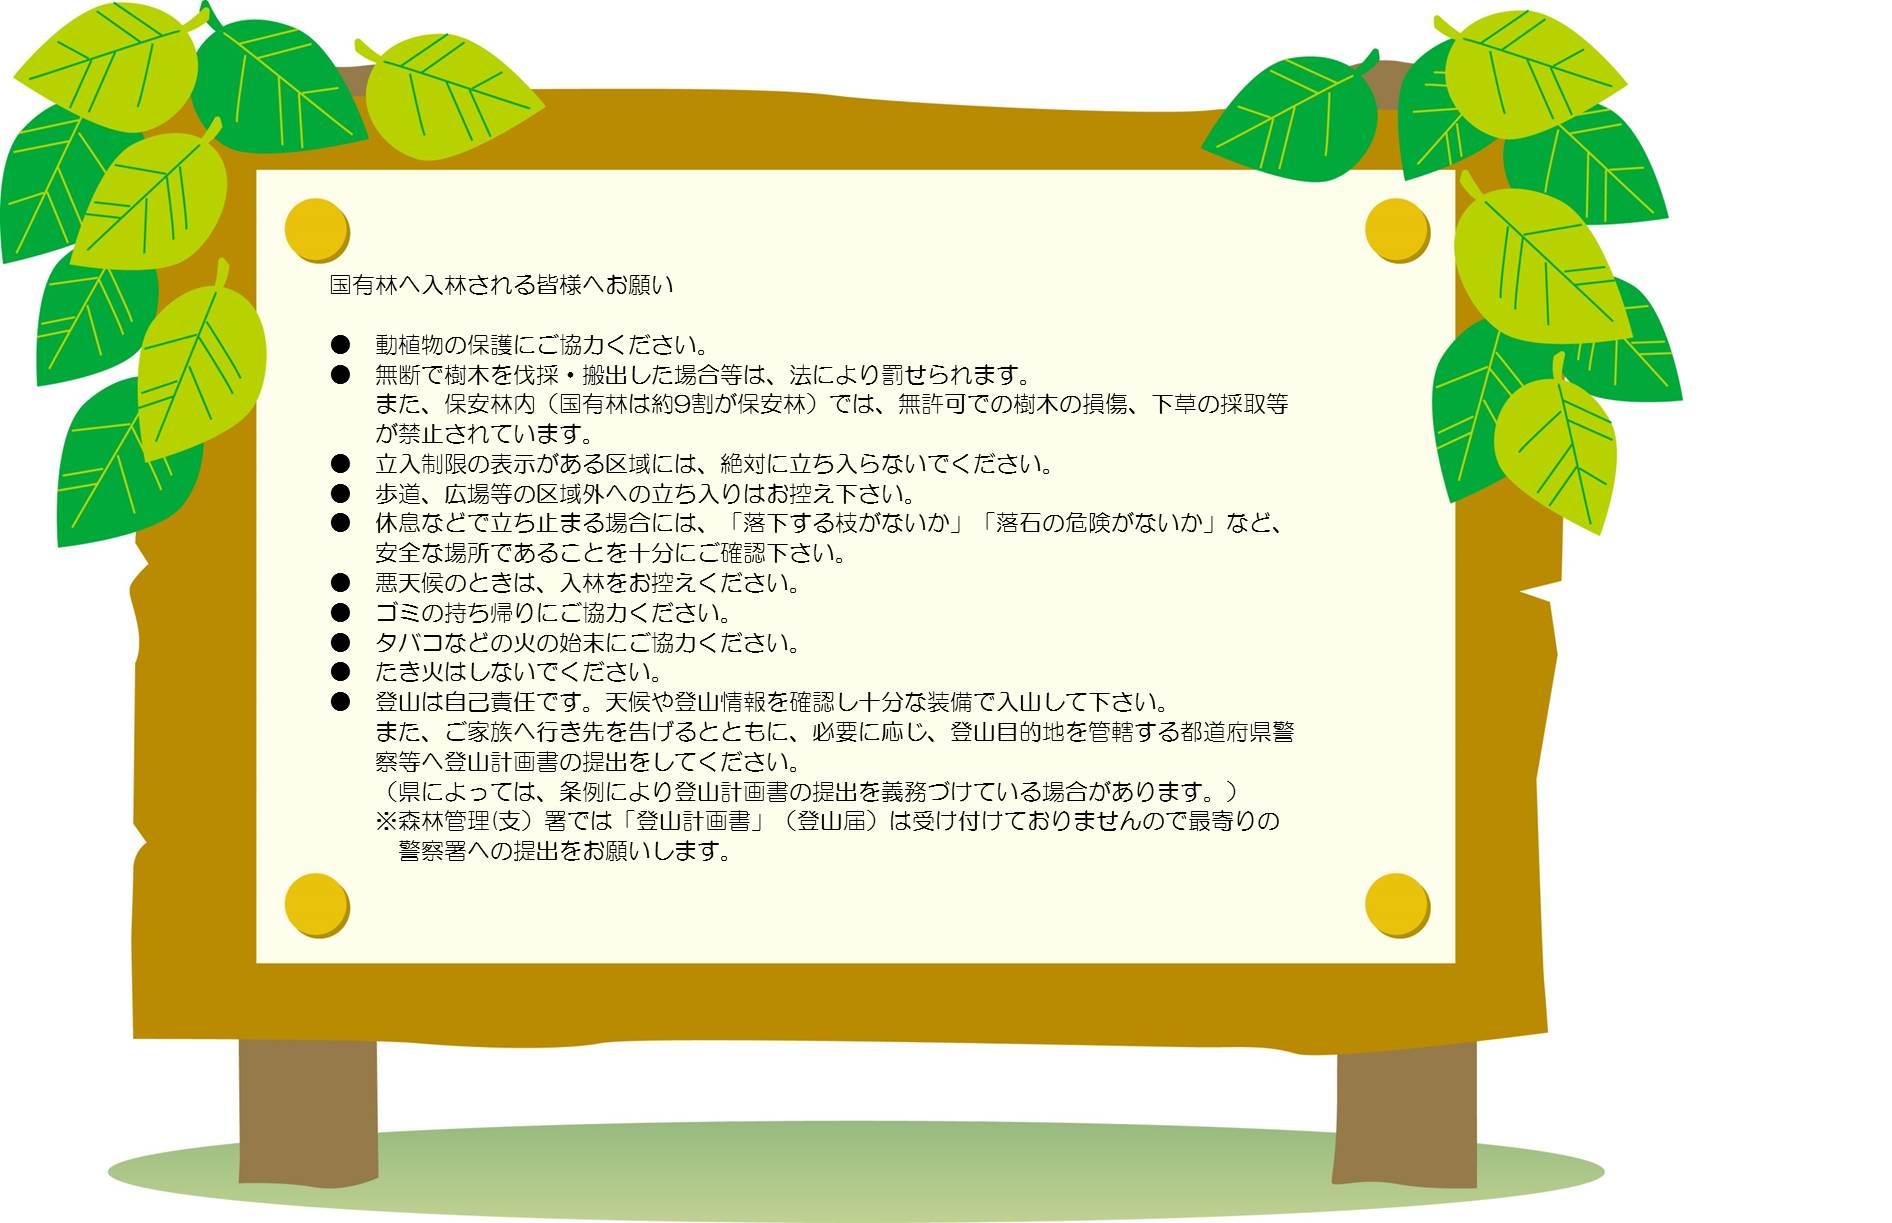 国有林への入林手続:東北森林管理局